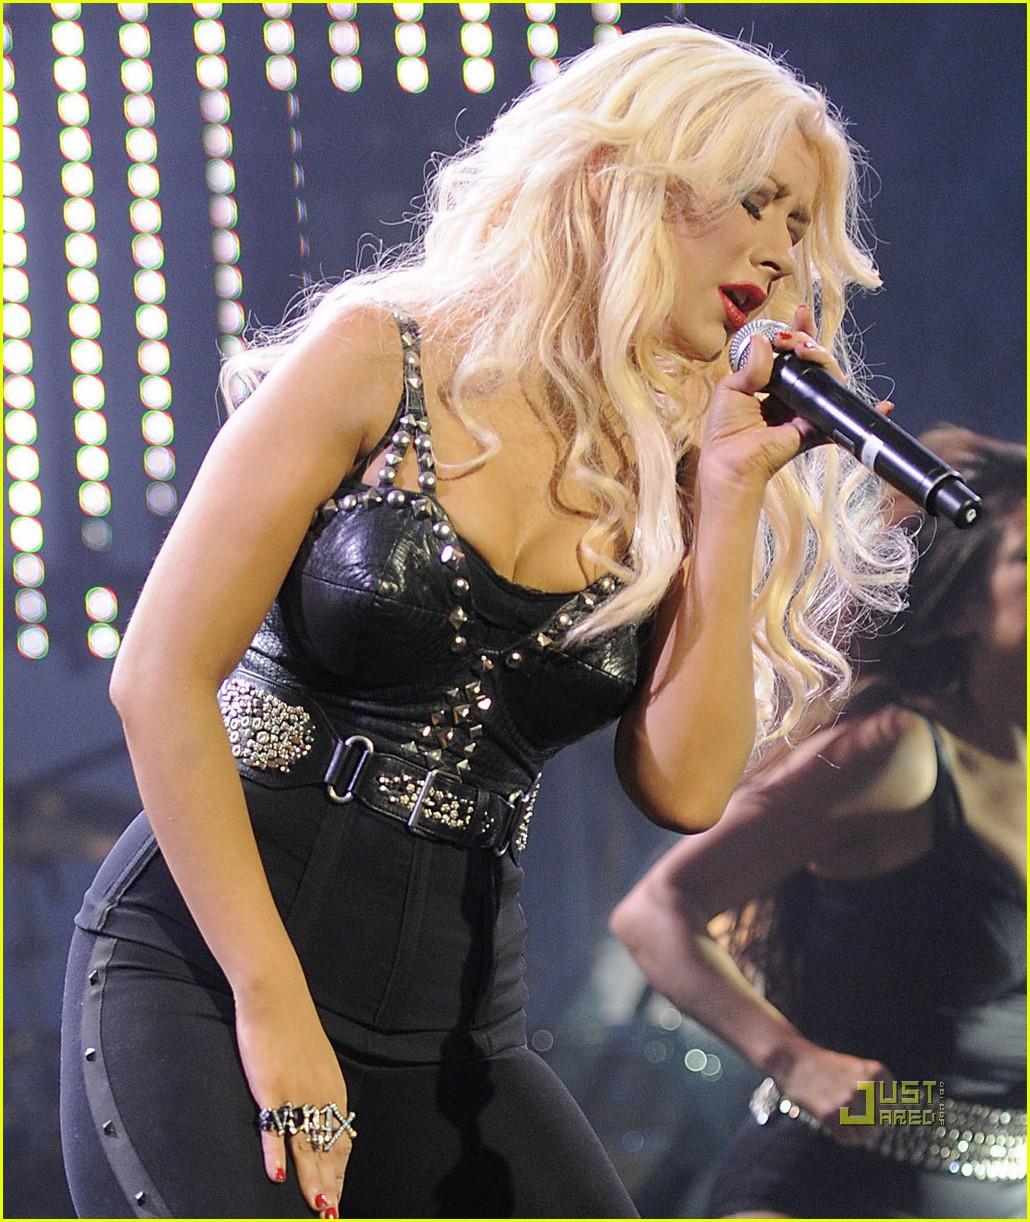 Christina Aguilera: 'Justin Timberlake & Friends' Concert! Christina Aguilera